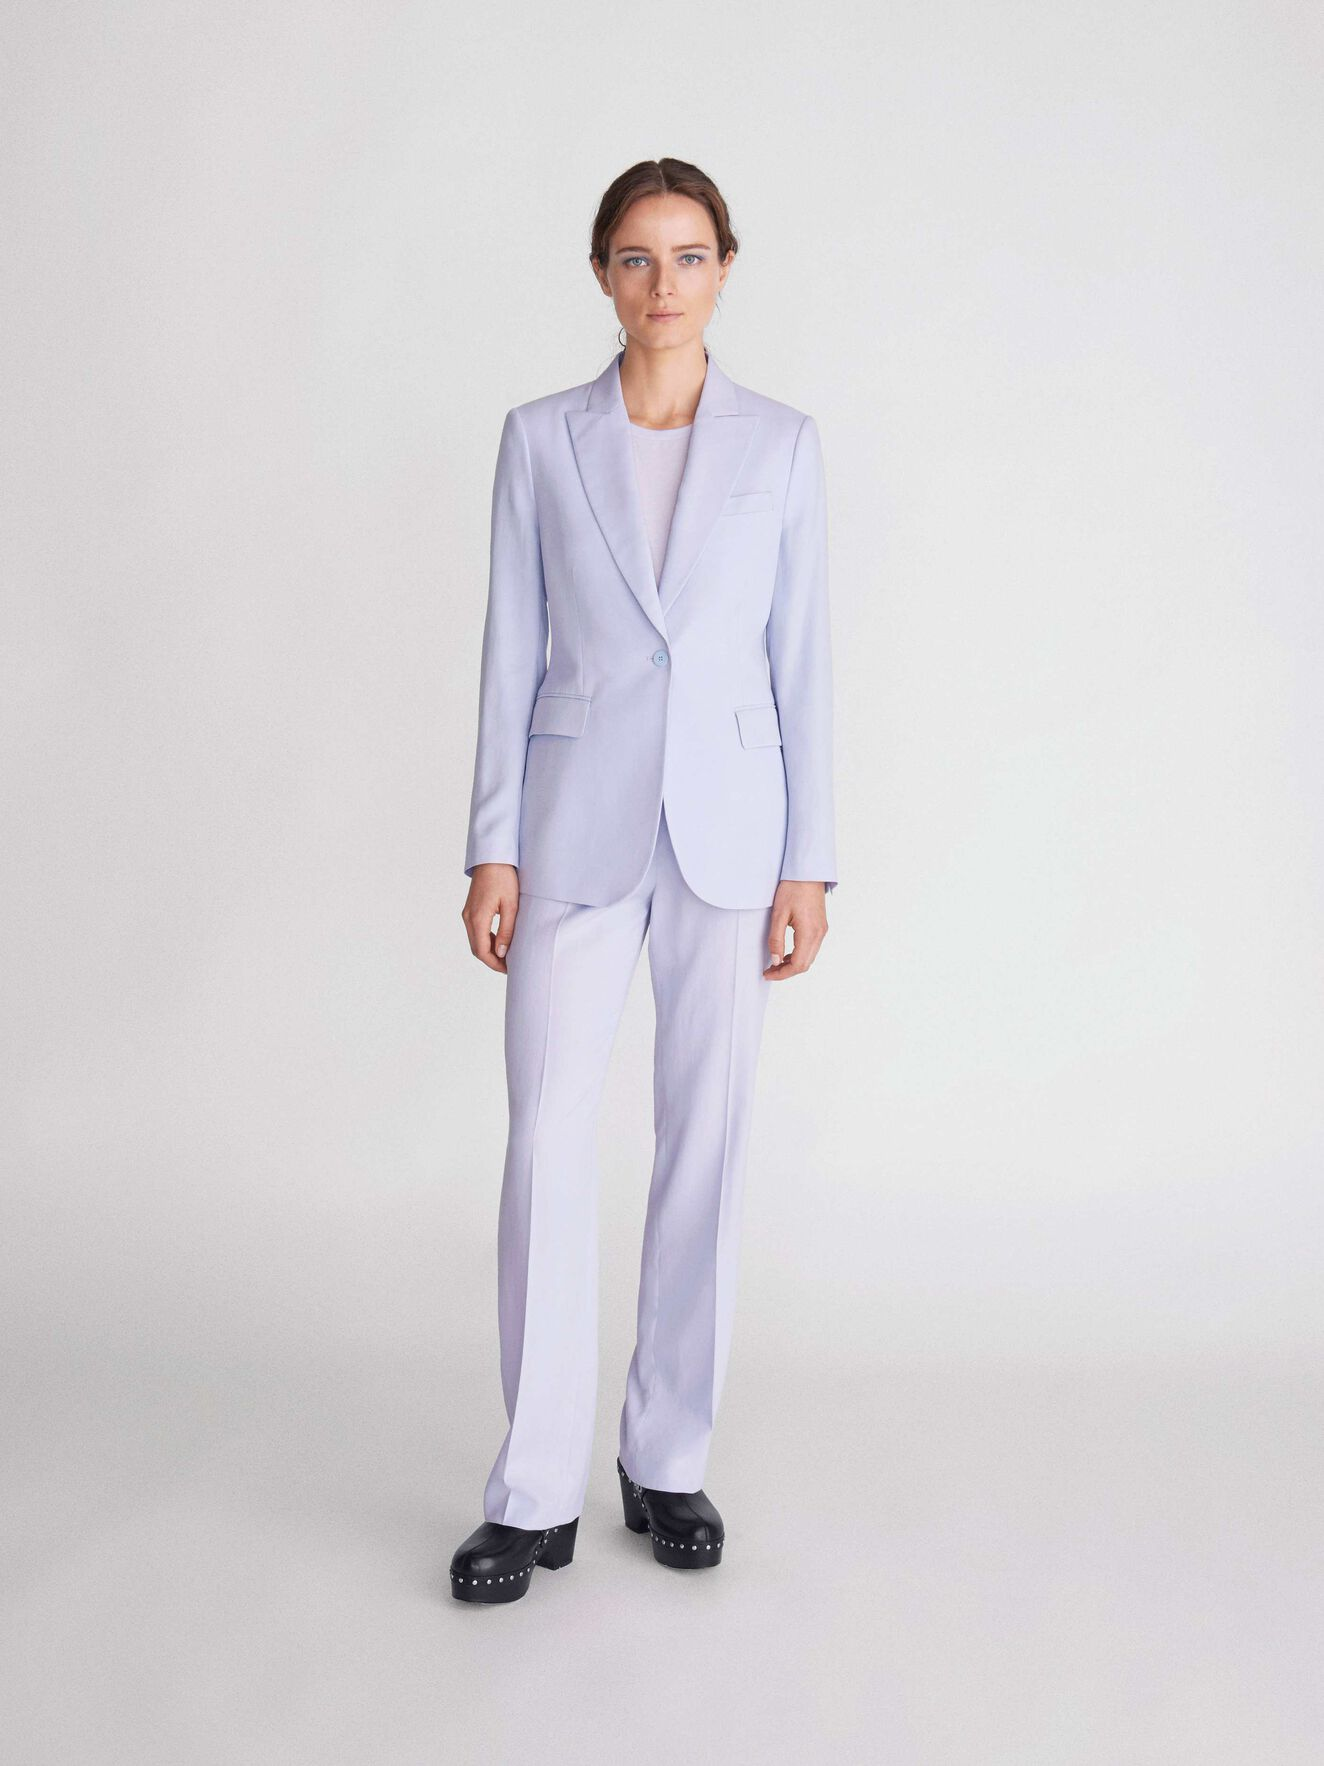 Kronblad Suit in  from Tiger of Sweden